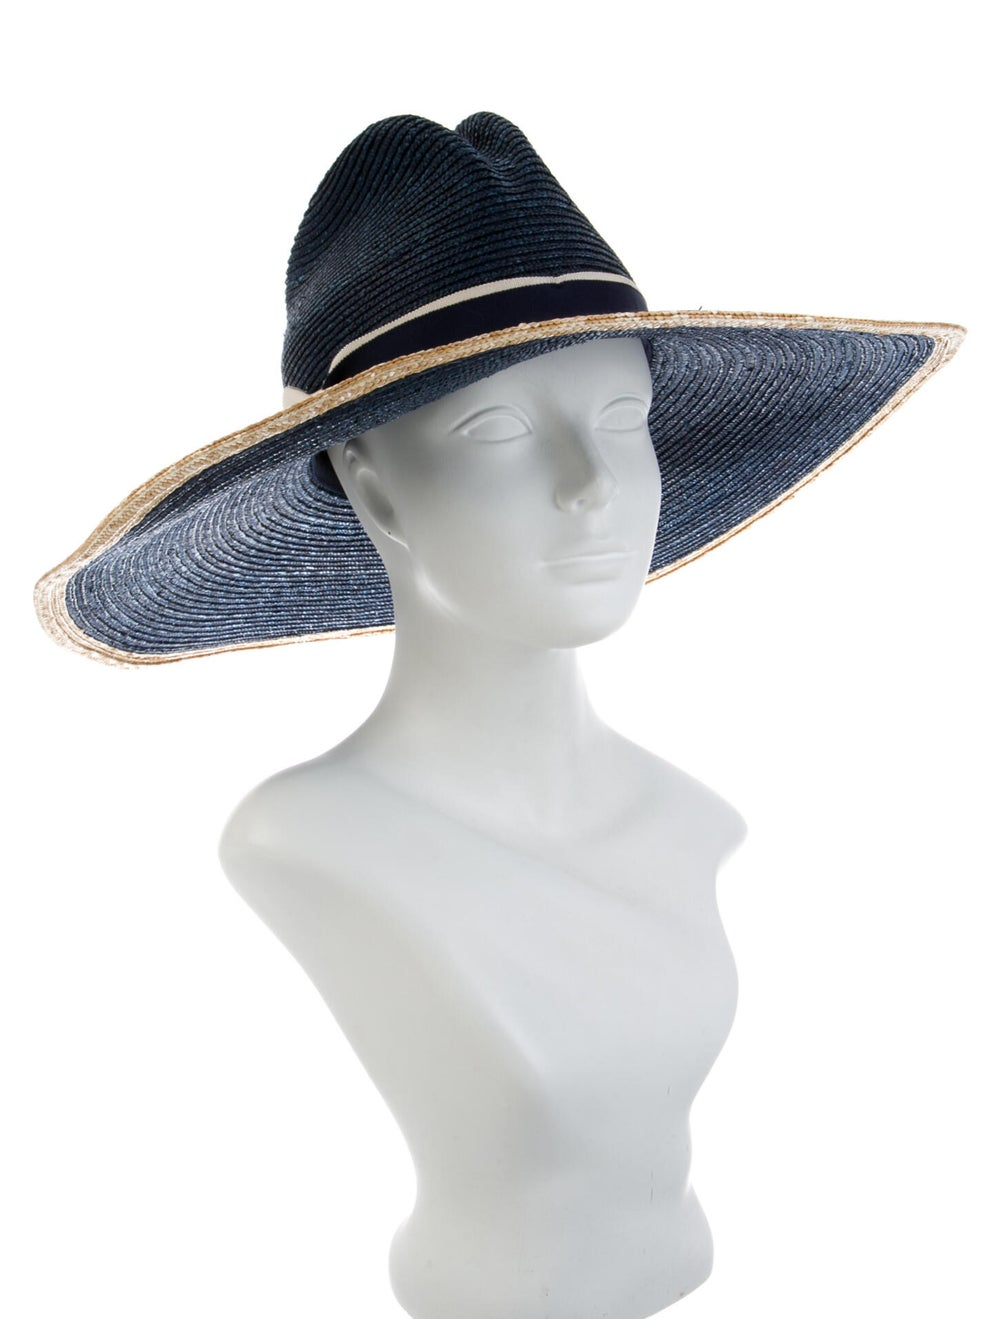 Veronica Beard Straw Wide Brim Hat Blue - image 3